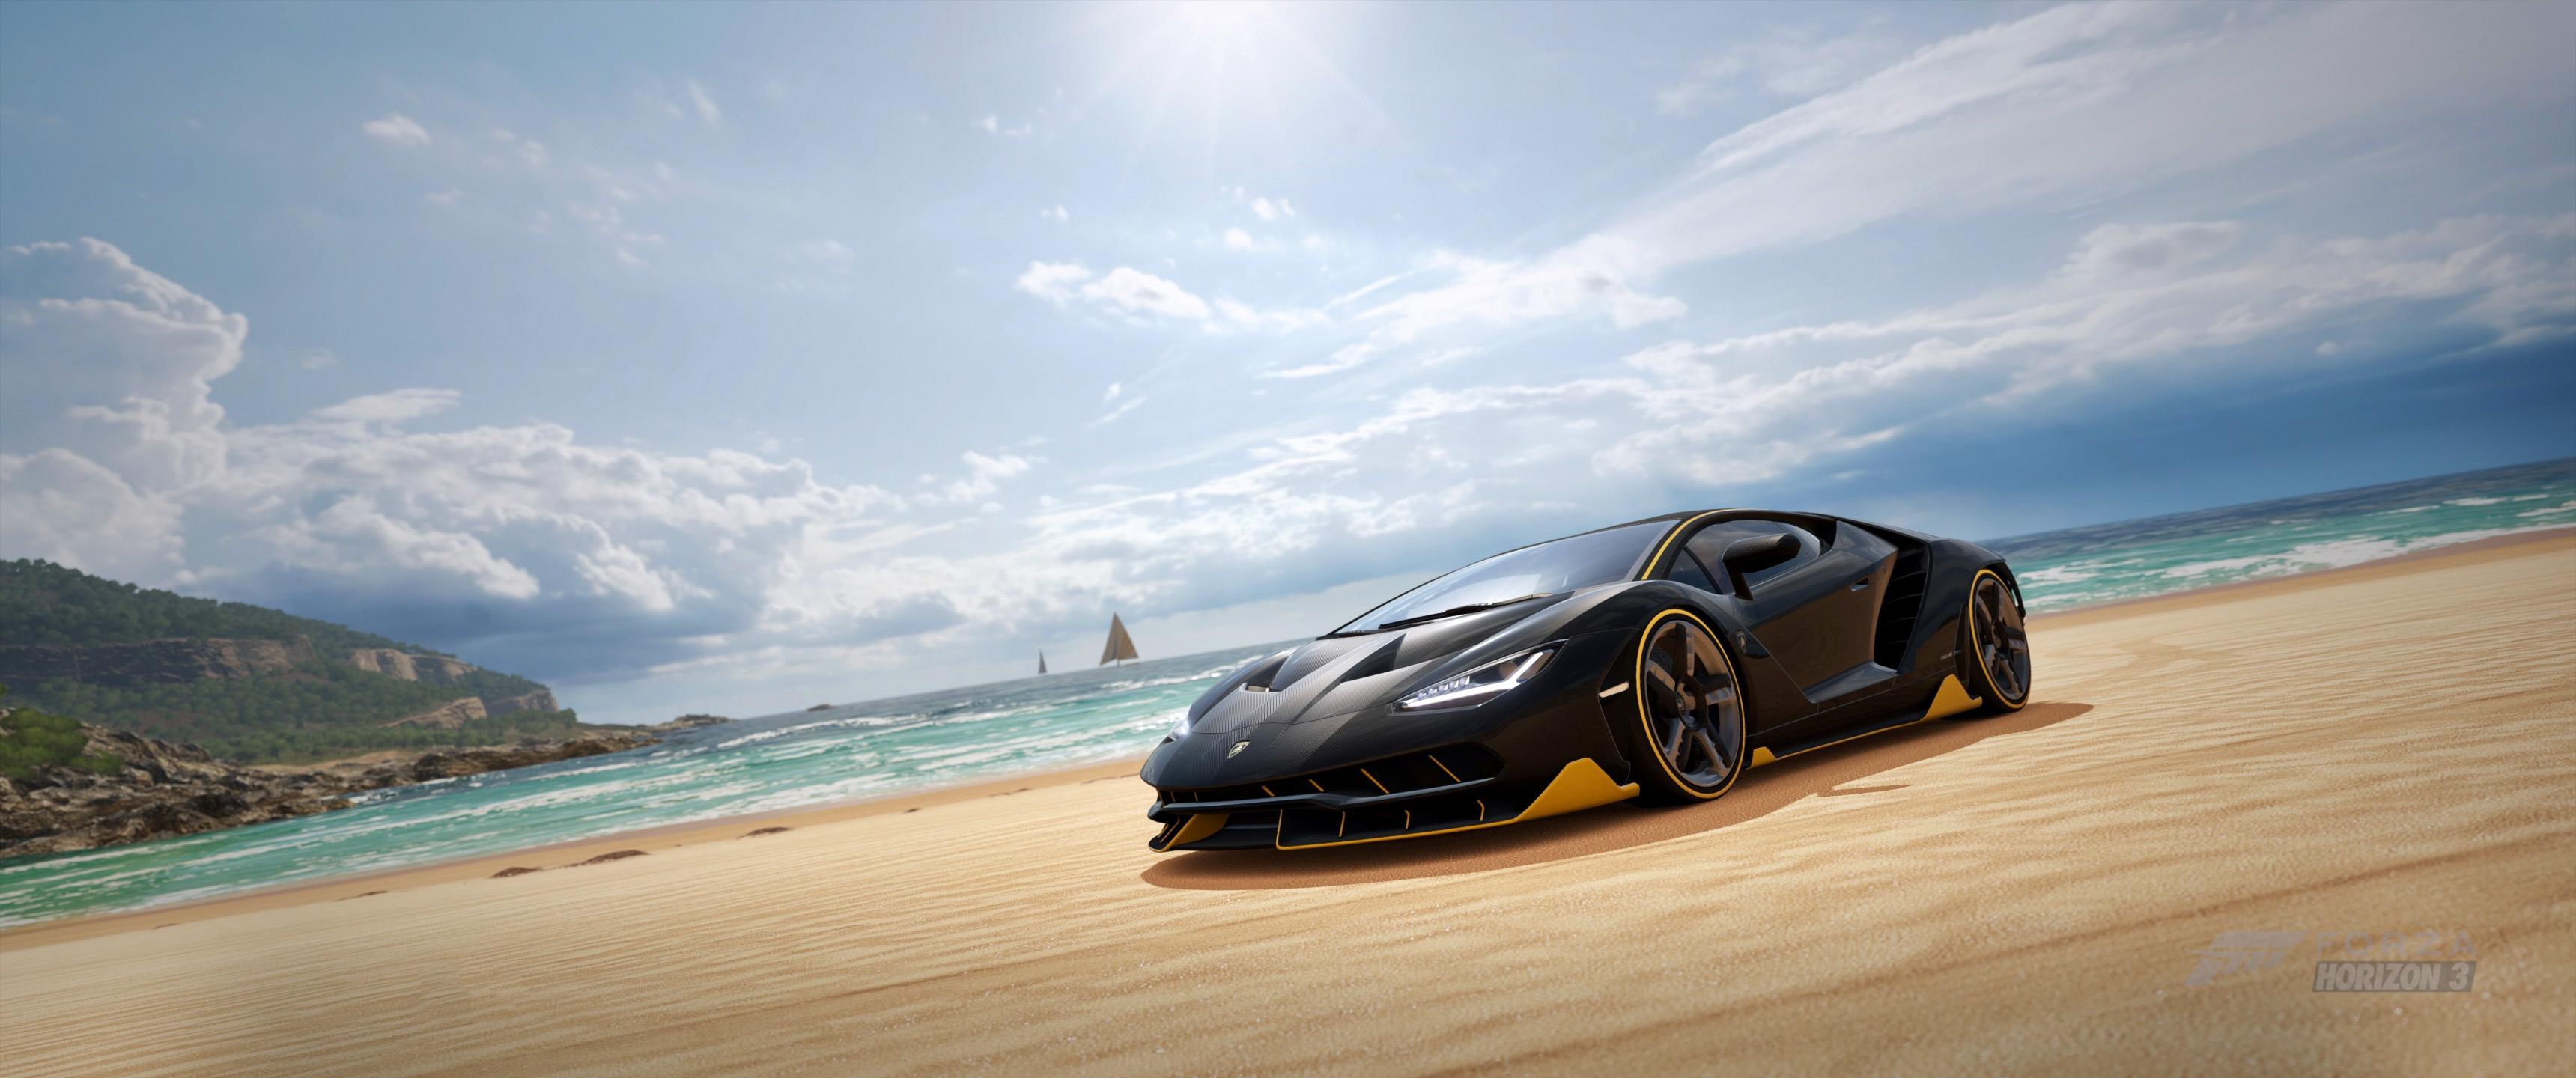 Forza Horizon 3 Classic Car | Games HD 4k Wallpapers